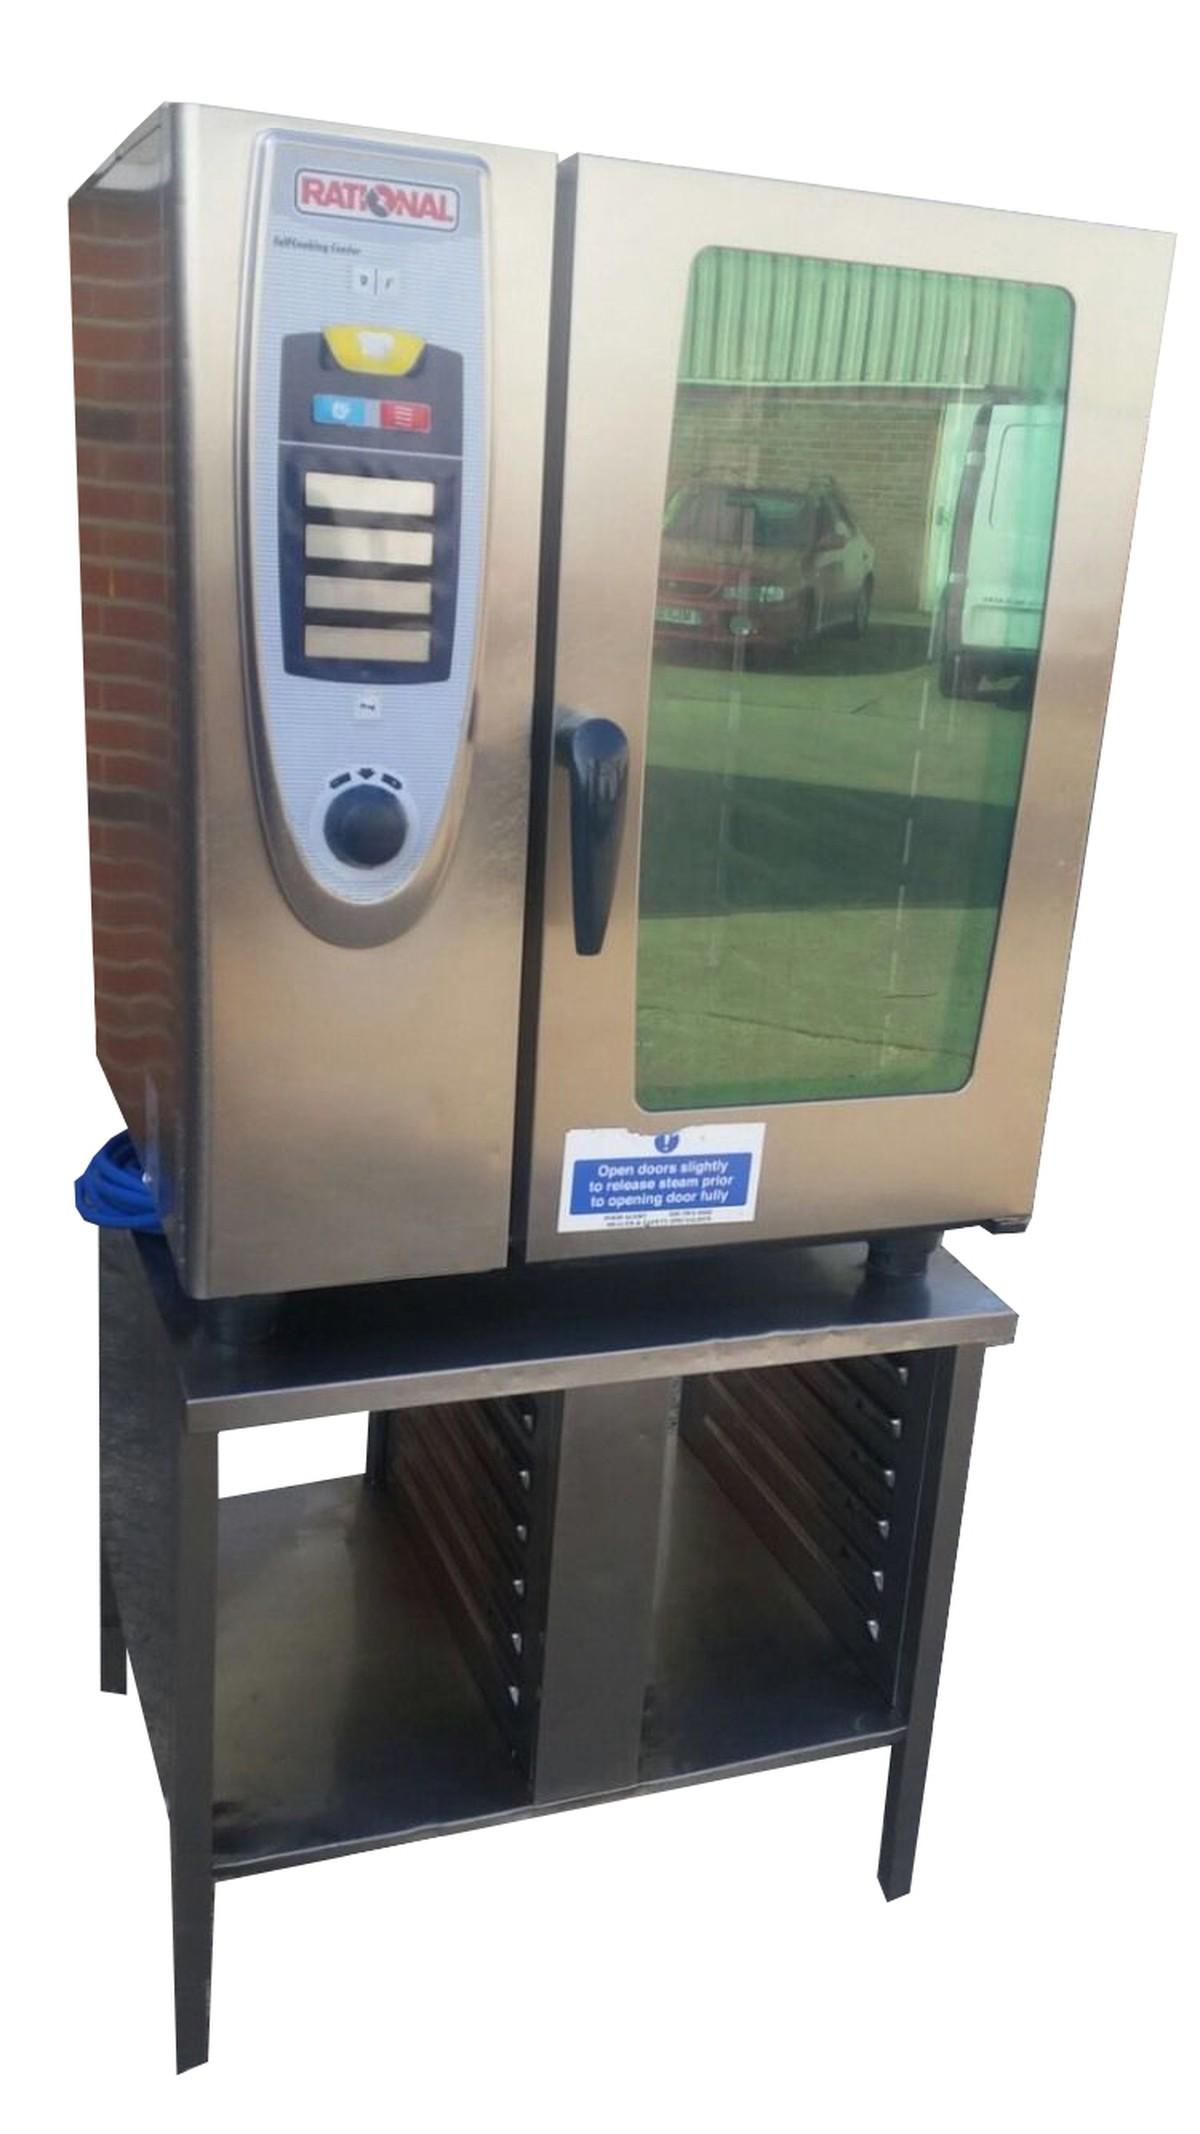 Catering Equipment Rentals Combi Ovens Electric